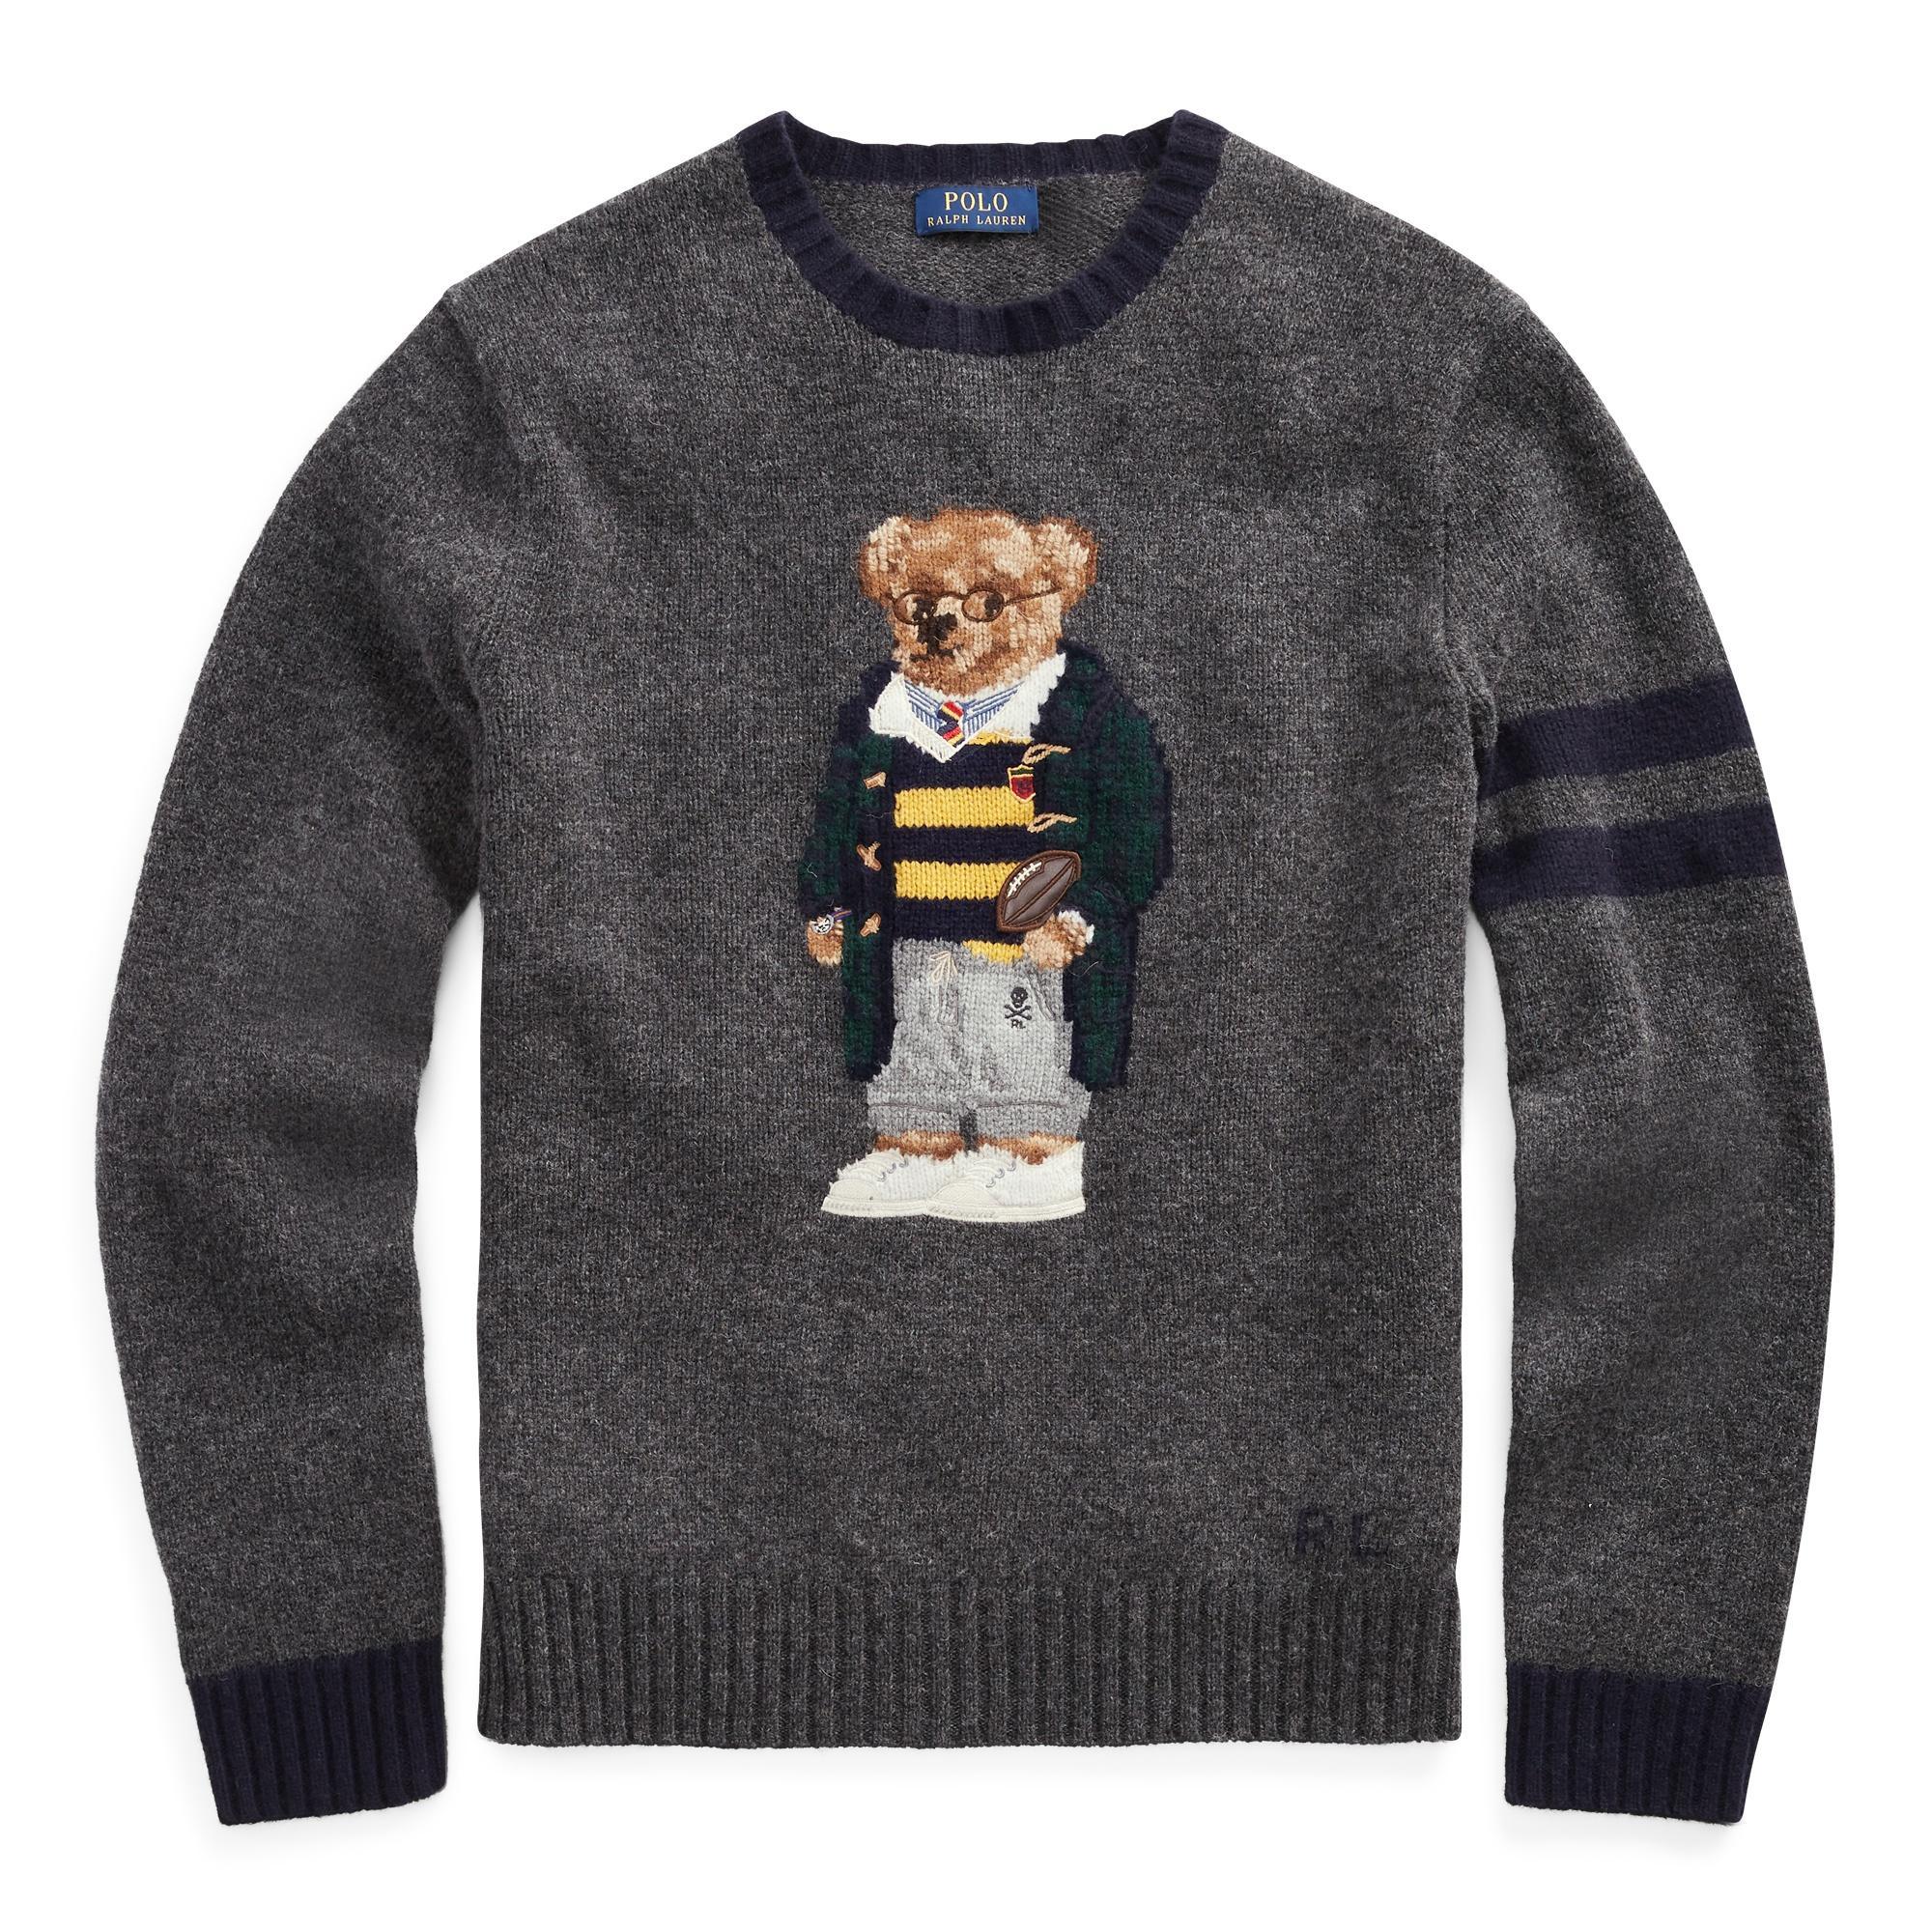 1c774615b Polo Ralph Lauren Polo Bear Jumper in Gray for Men - Lyst